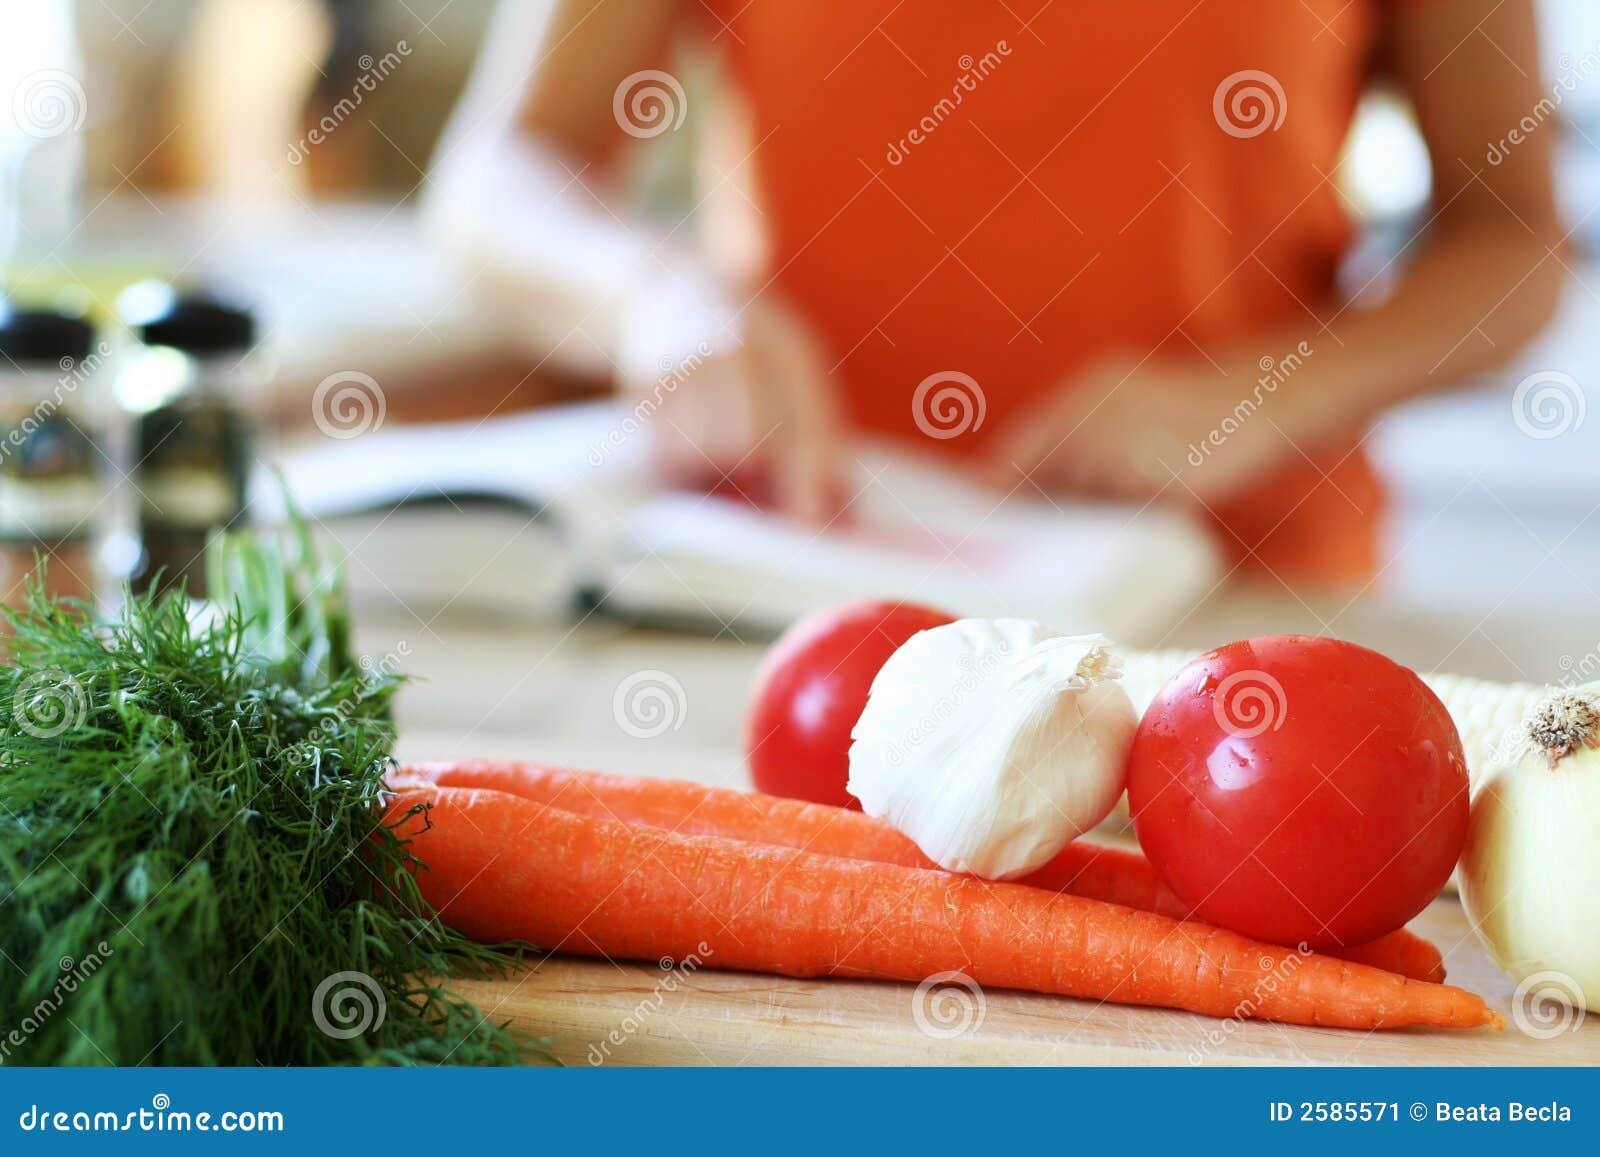 Checking recipe